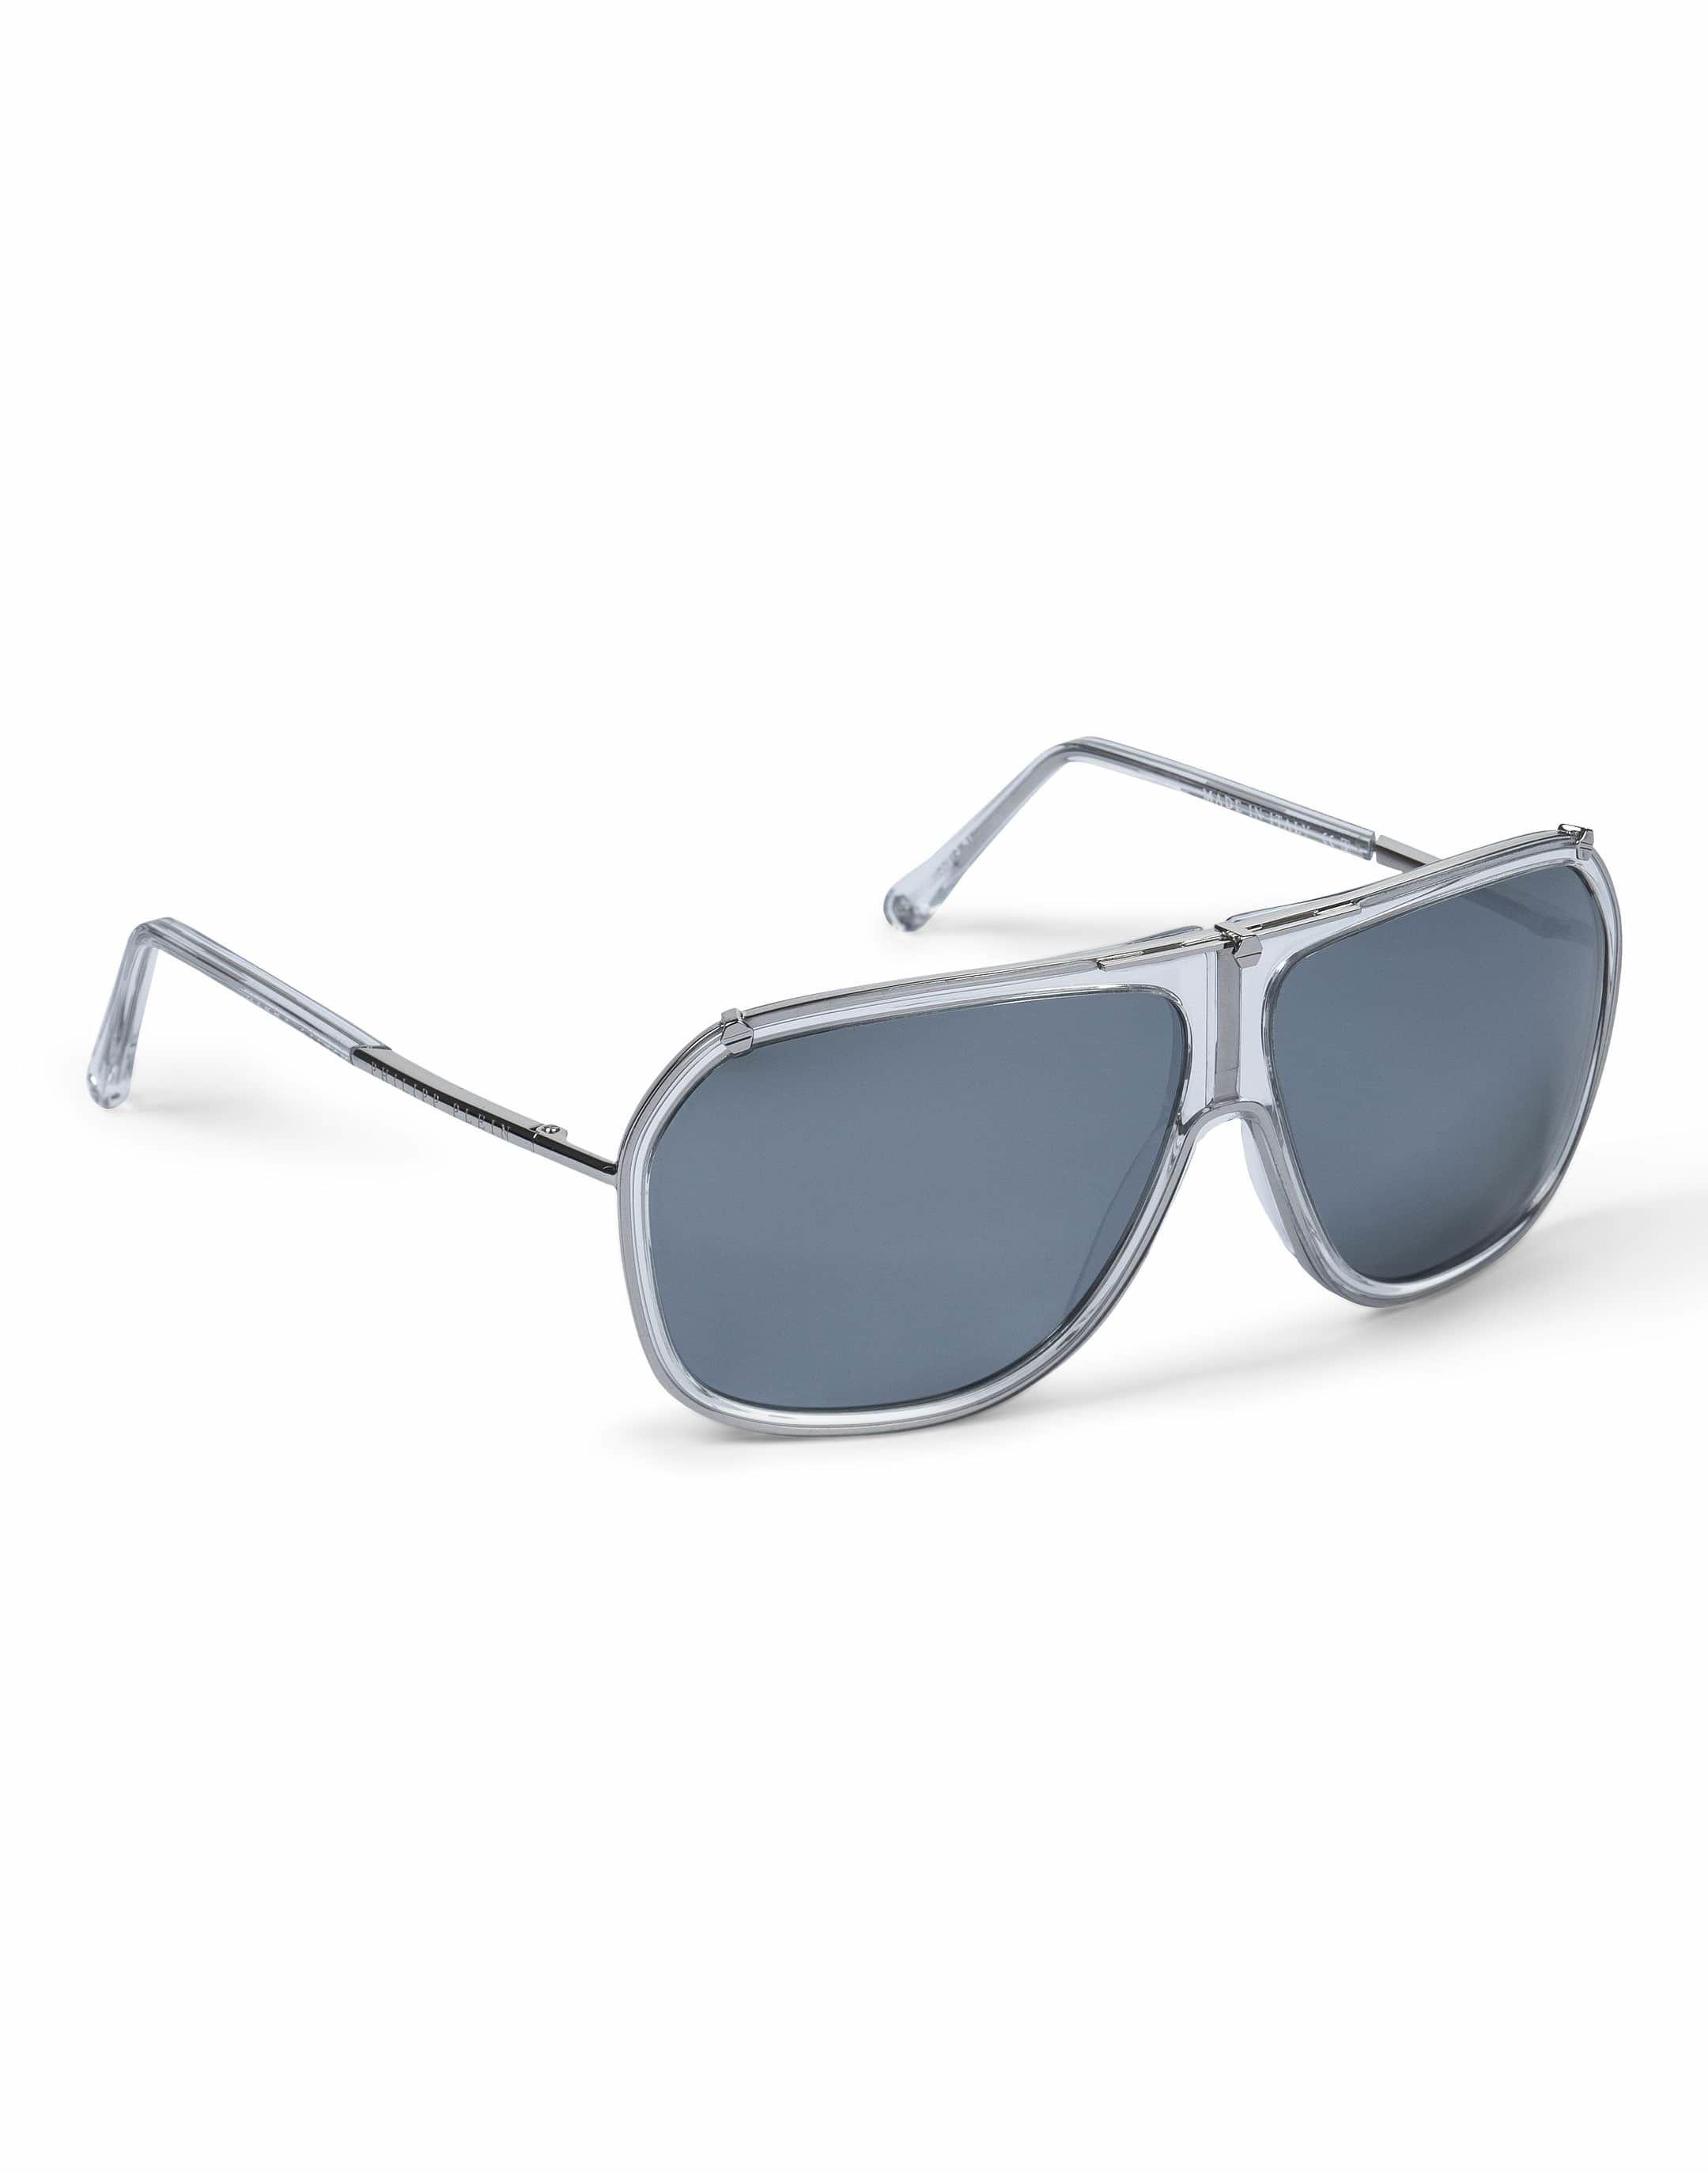 Philipp Plein Sunglasses